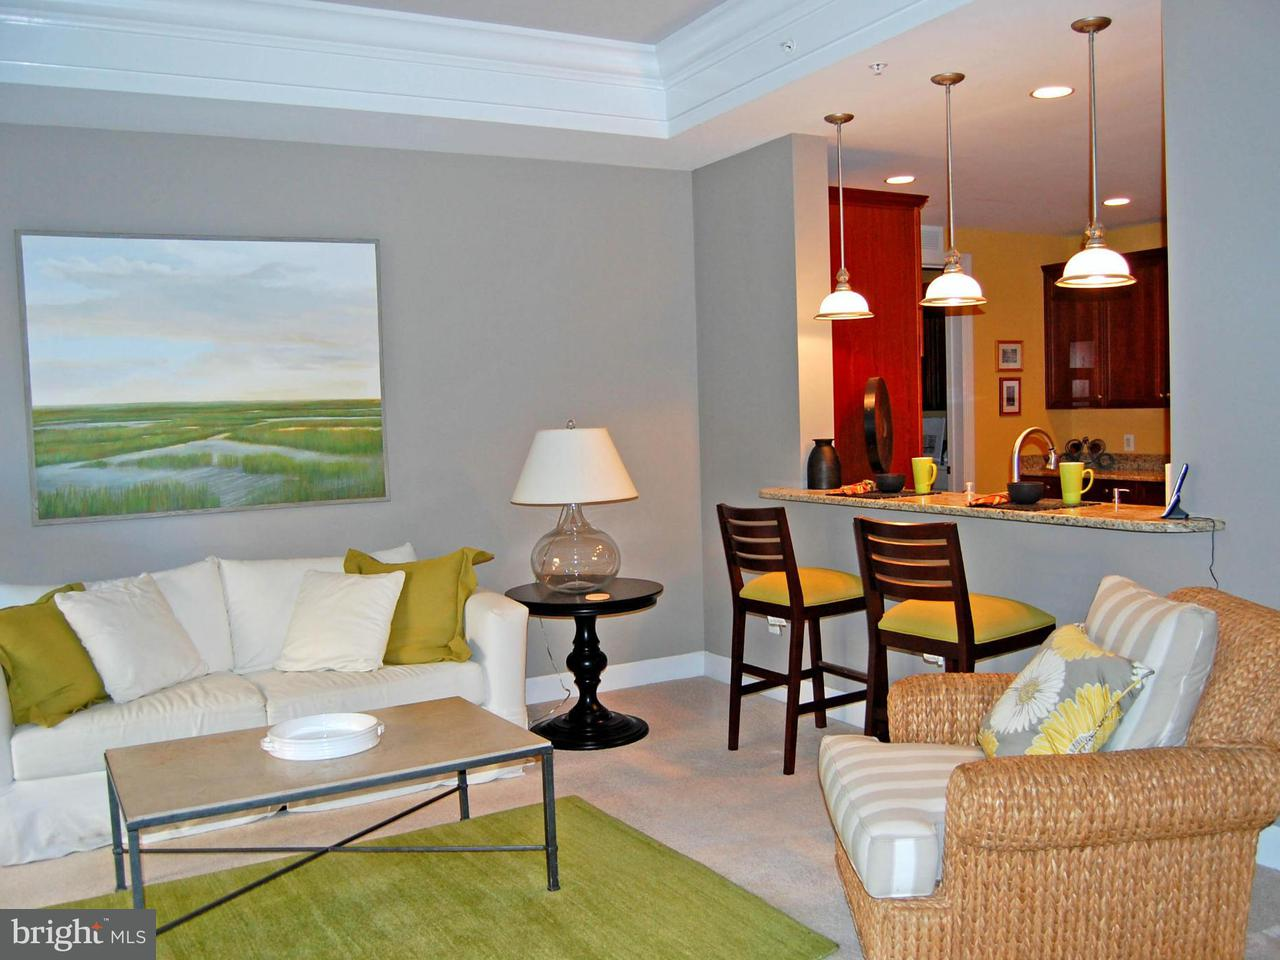 Condominium for Sale at 1915 Towne Centre Blvd #206 1915 Towne Centre Blvd #206 Annapolis, Maryland 21401 United States